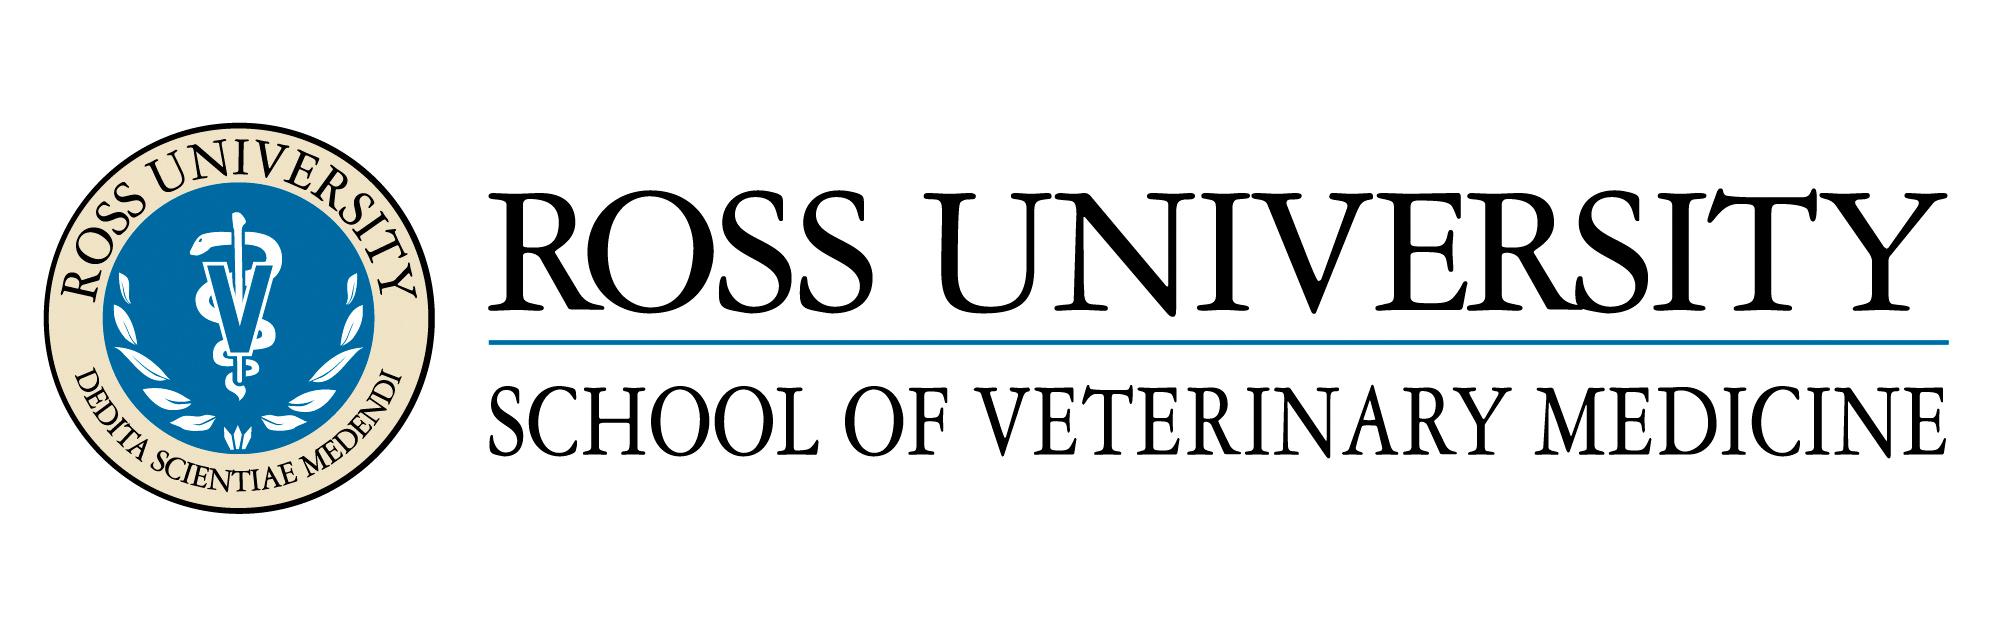 Image result for Ross University School of Veterinary Medicine